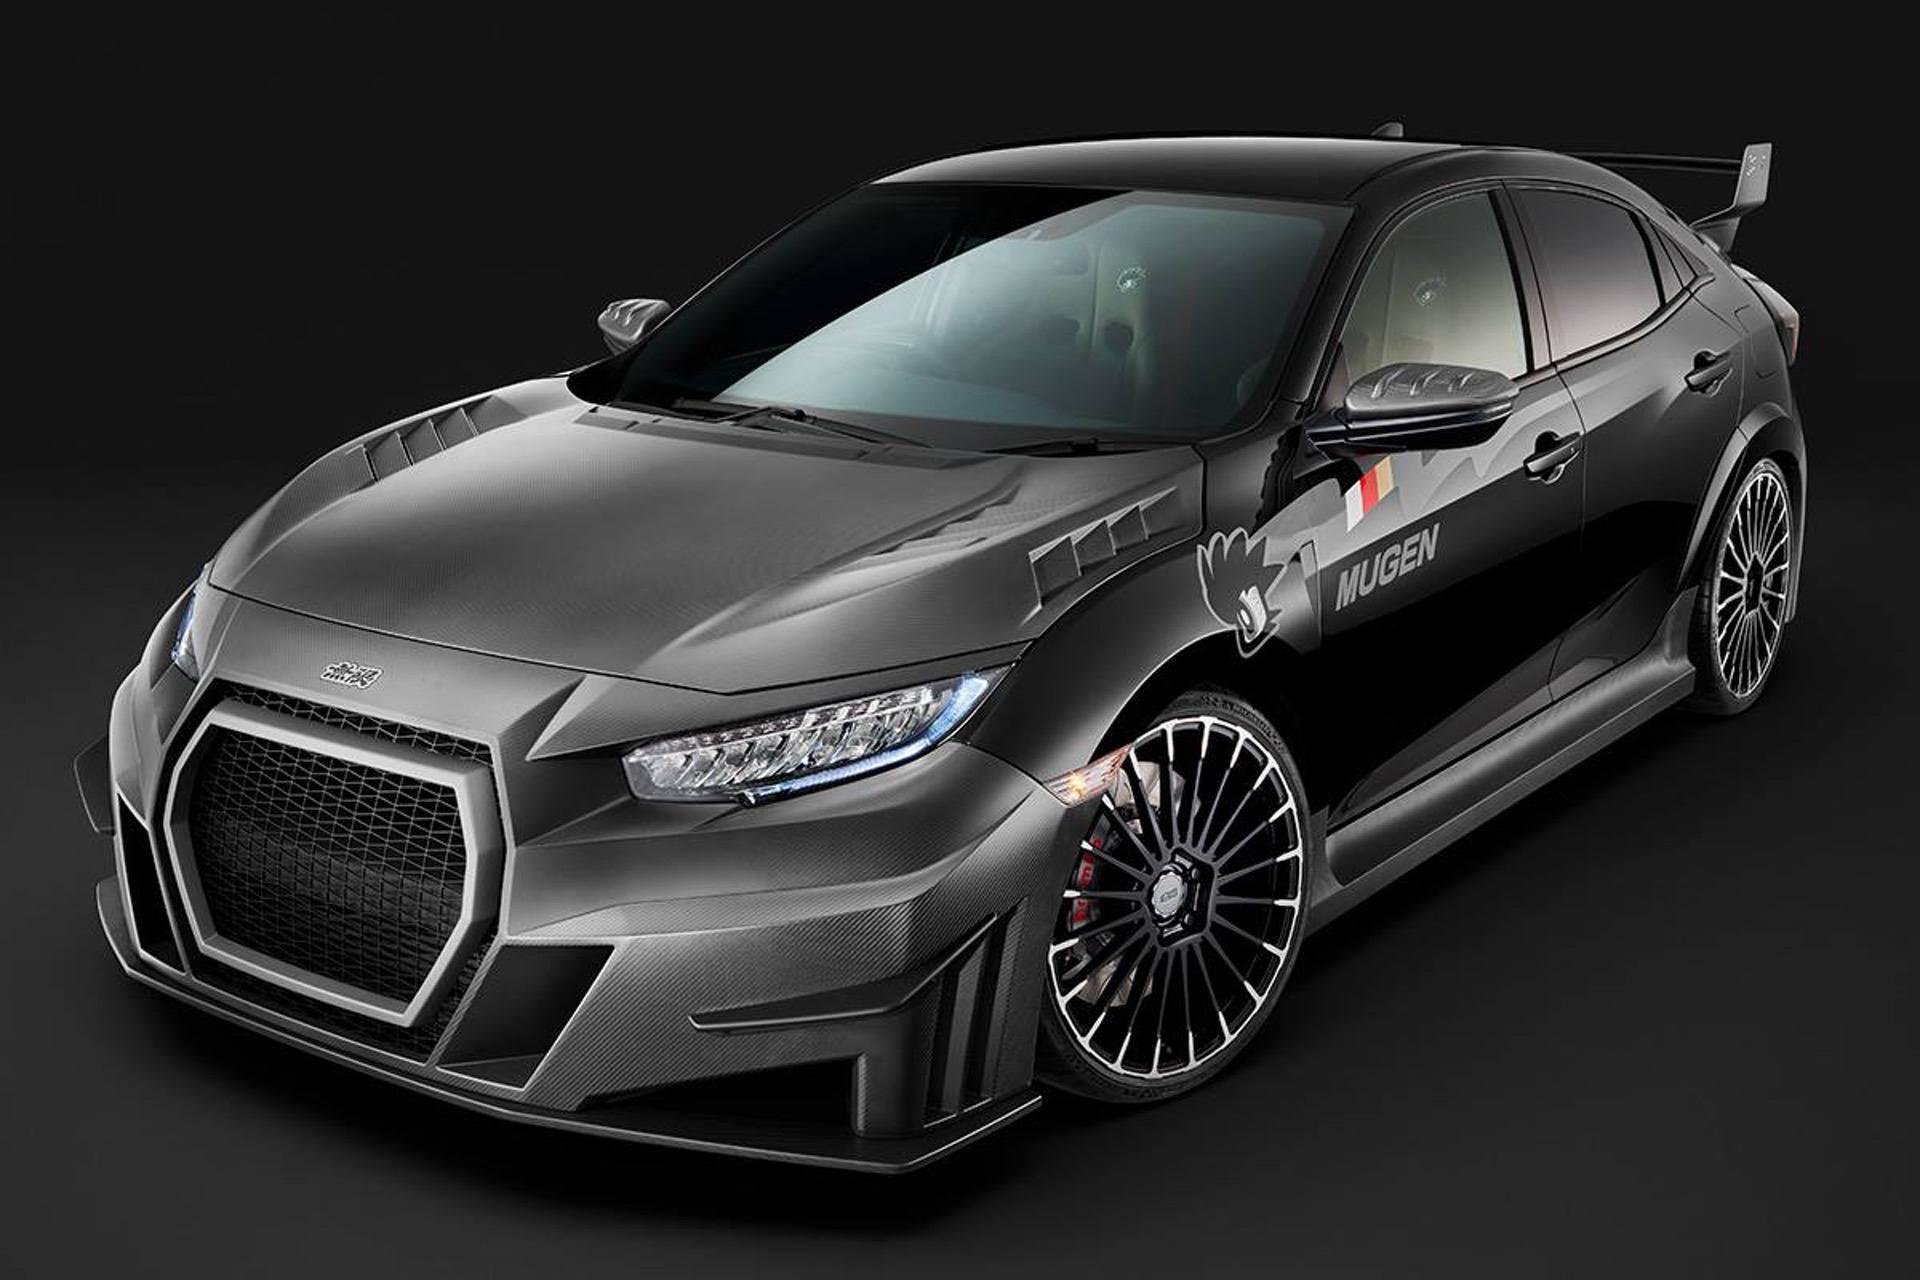 Honda_Civic_Type_R_Mugen_0004